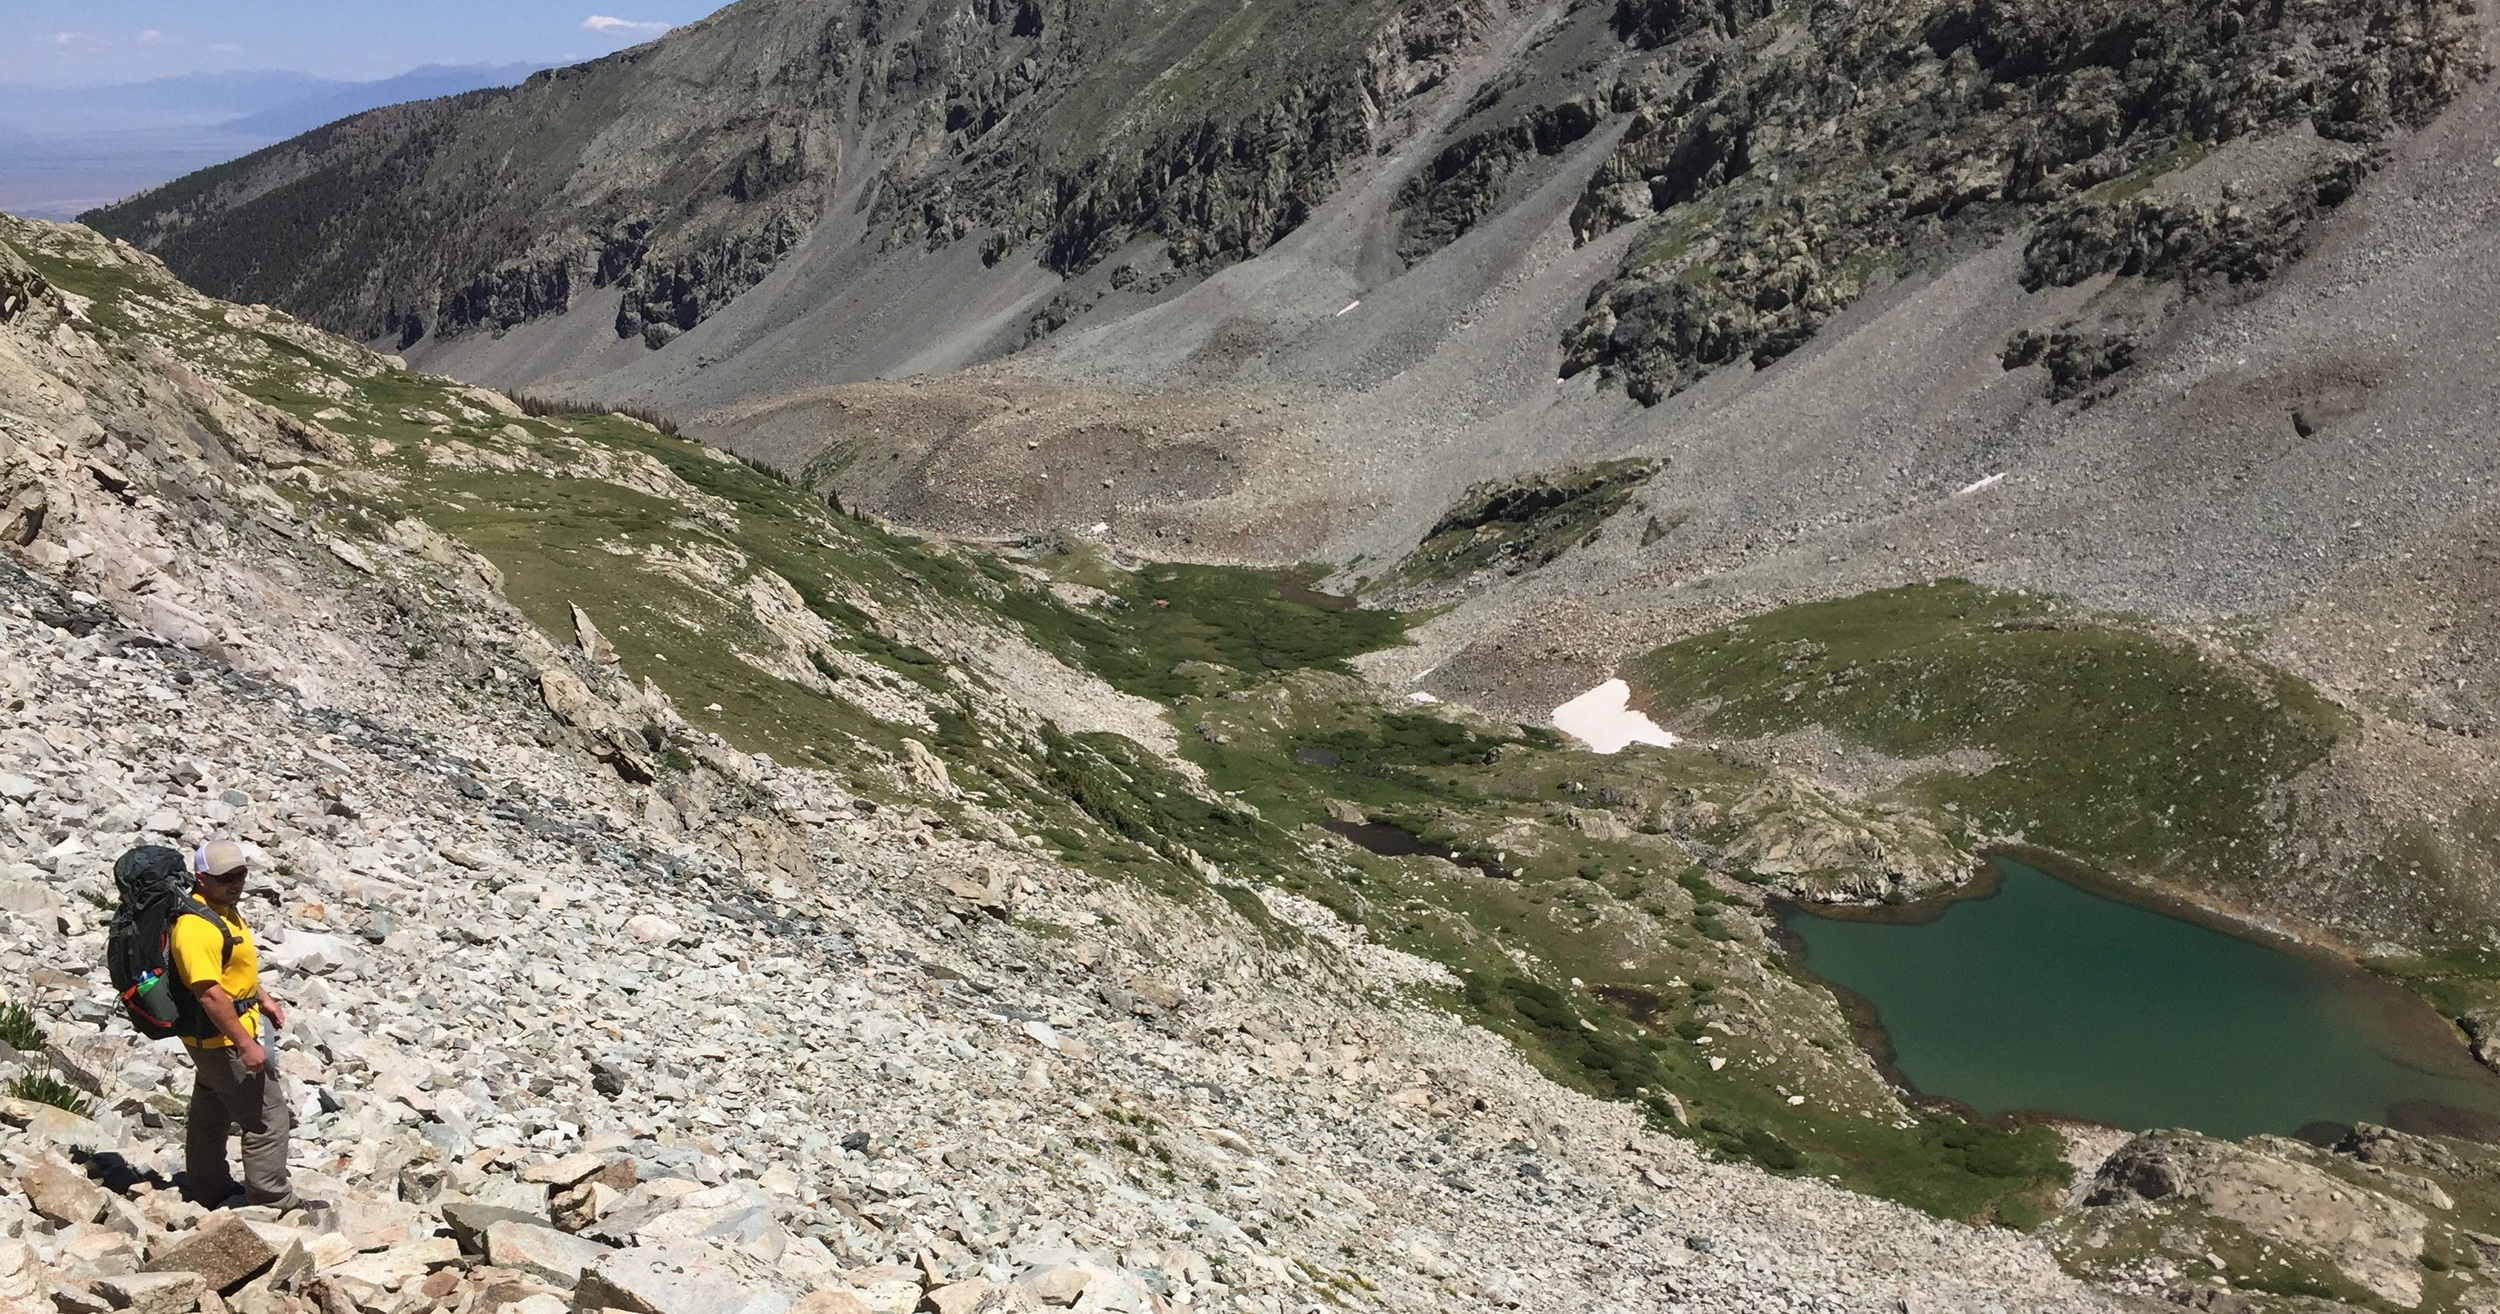 Wayne's hypoxia set in here, around 12,500 feet.